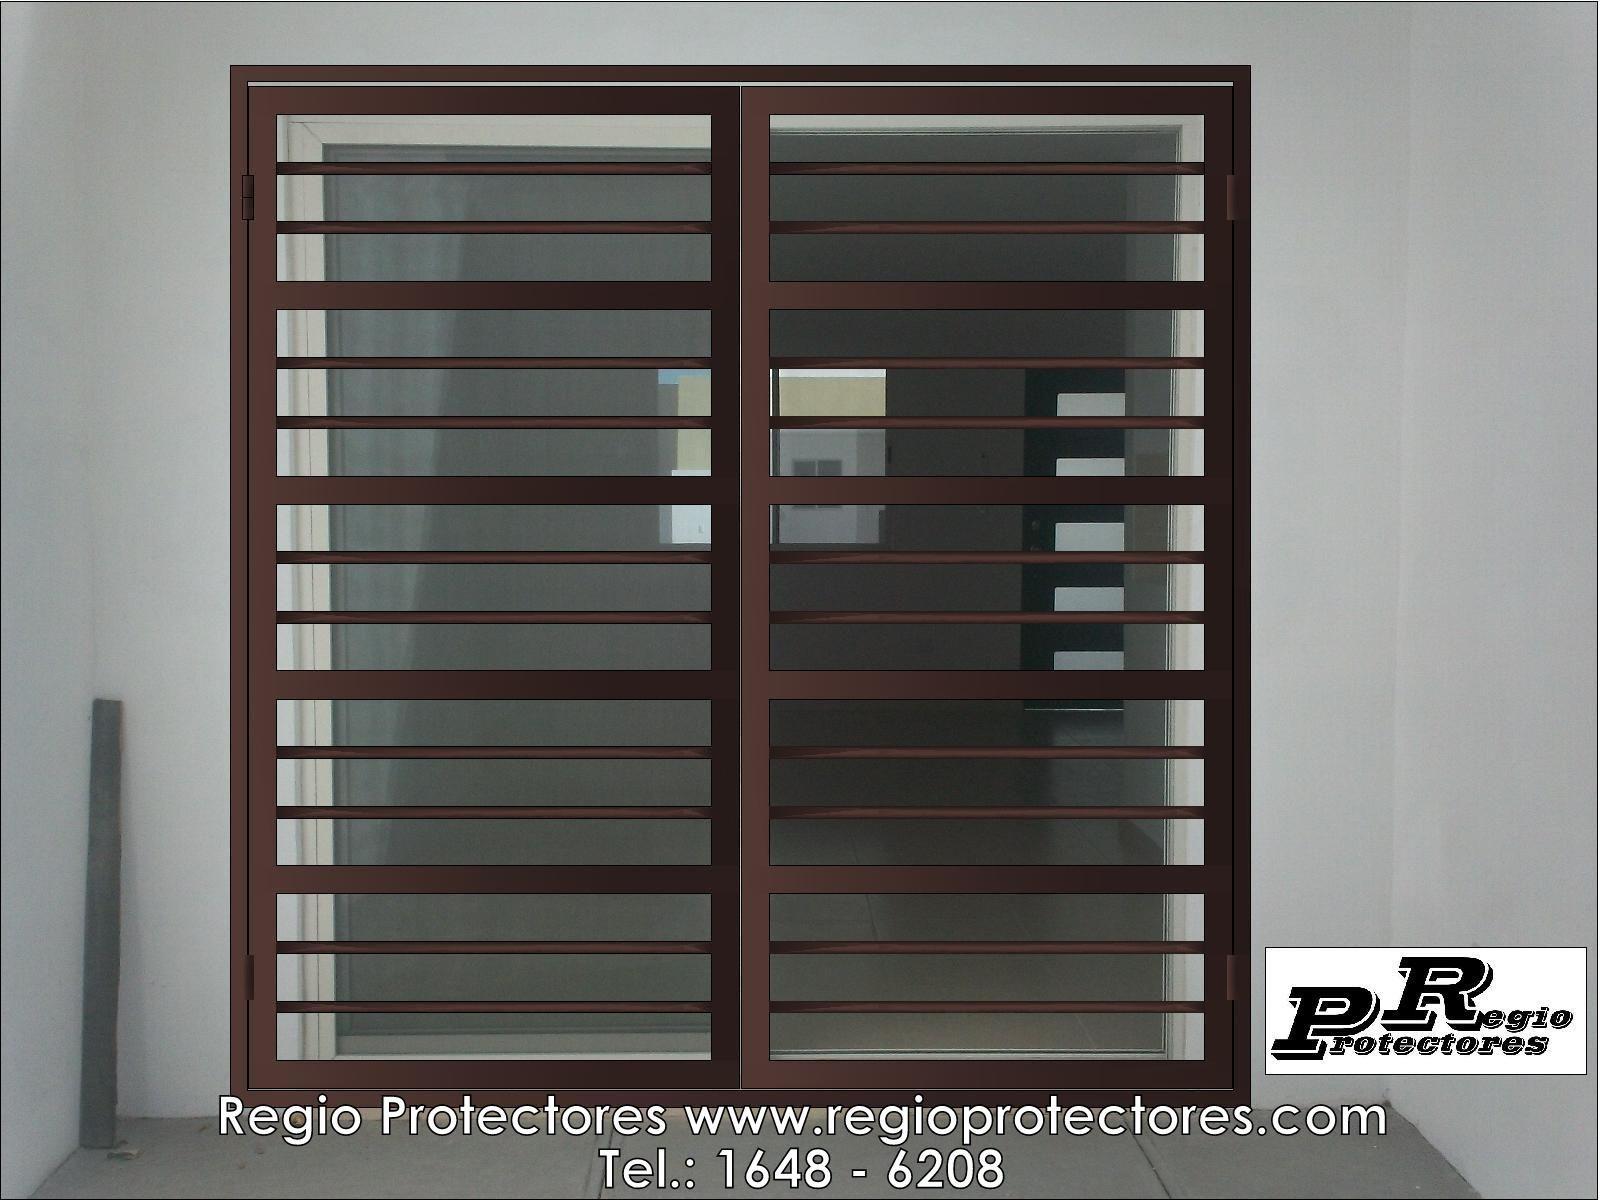 Herreria rodriguez fabricante de puertas y ventanas tattoo for Puerta de herreria